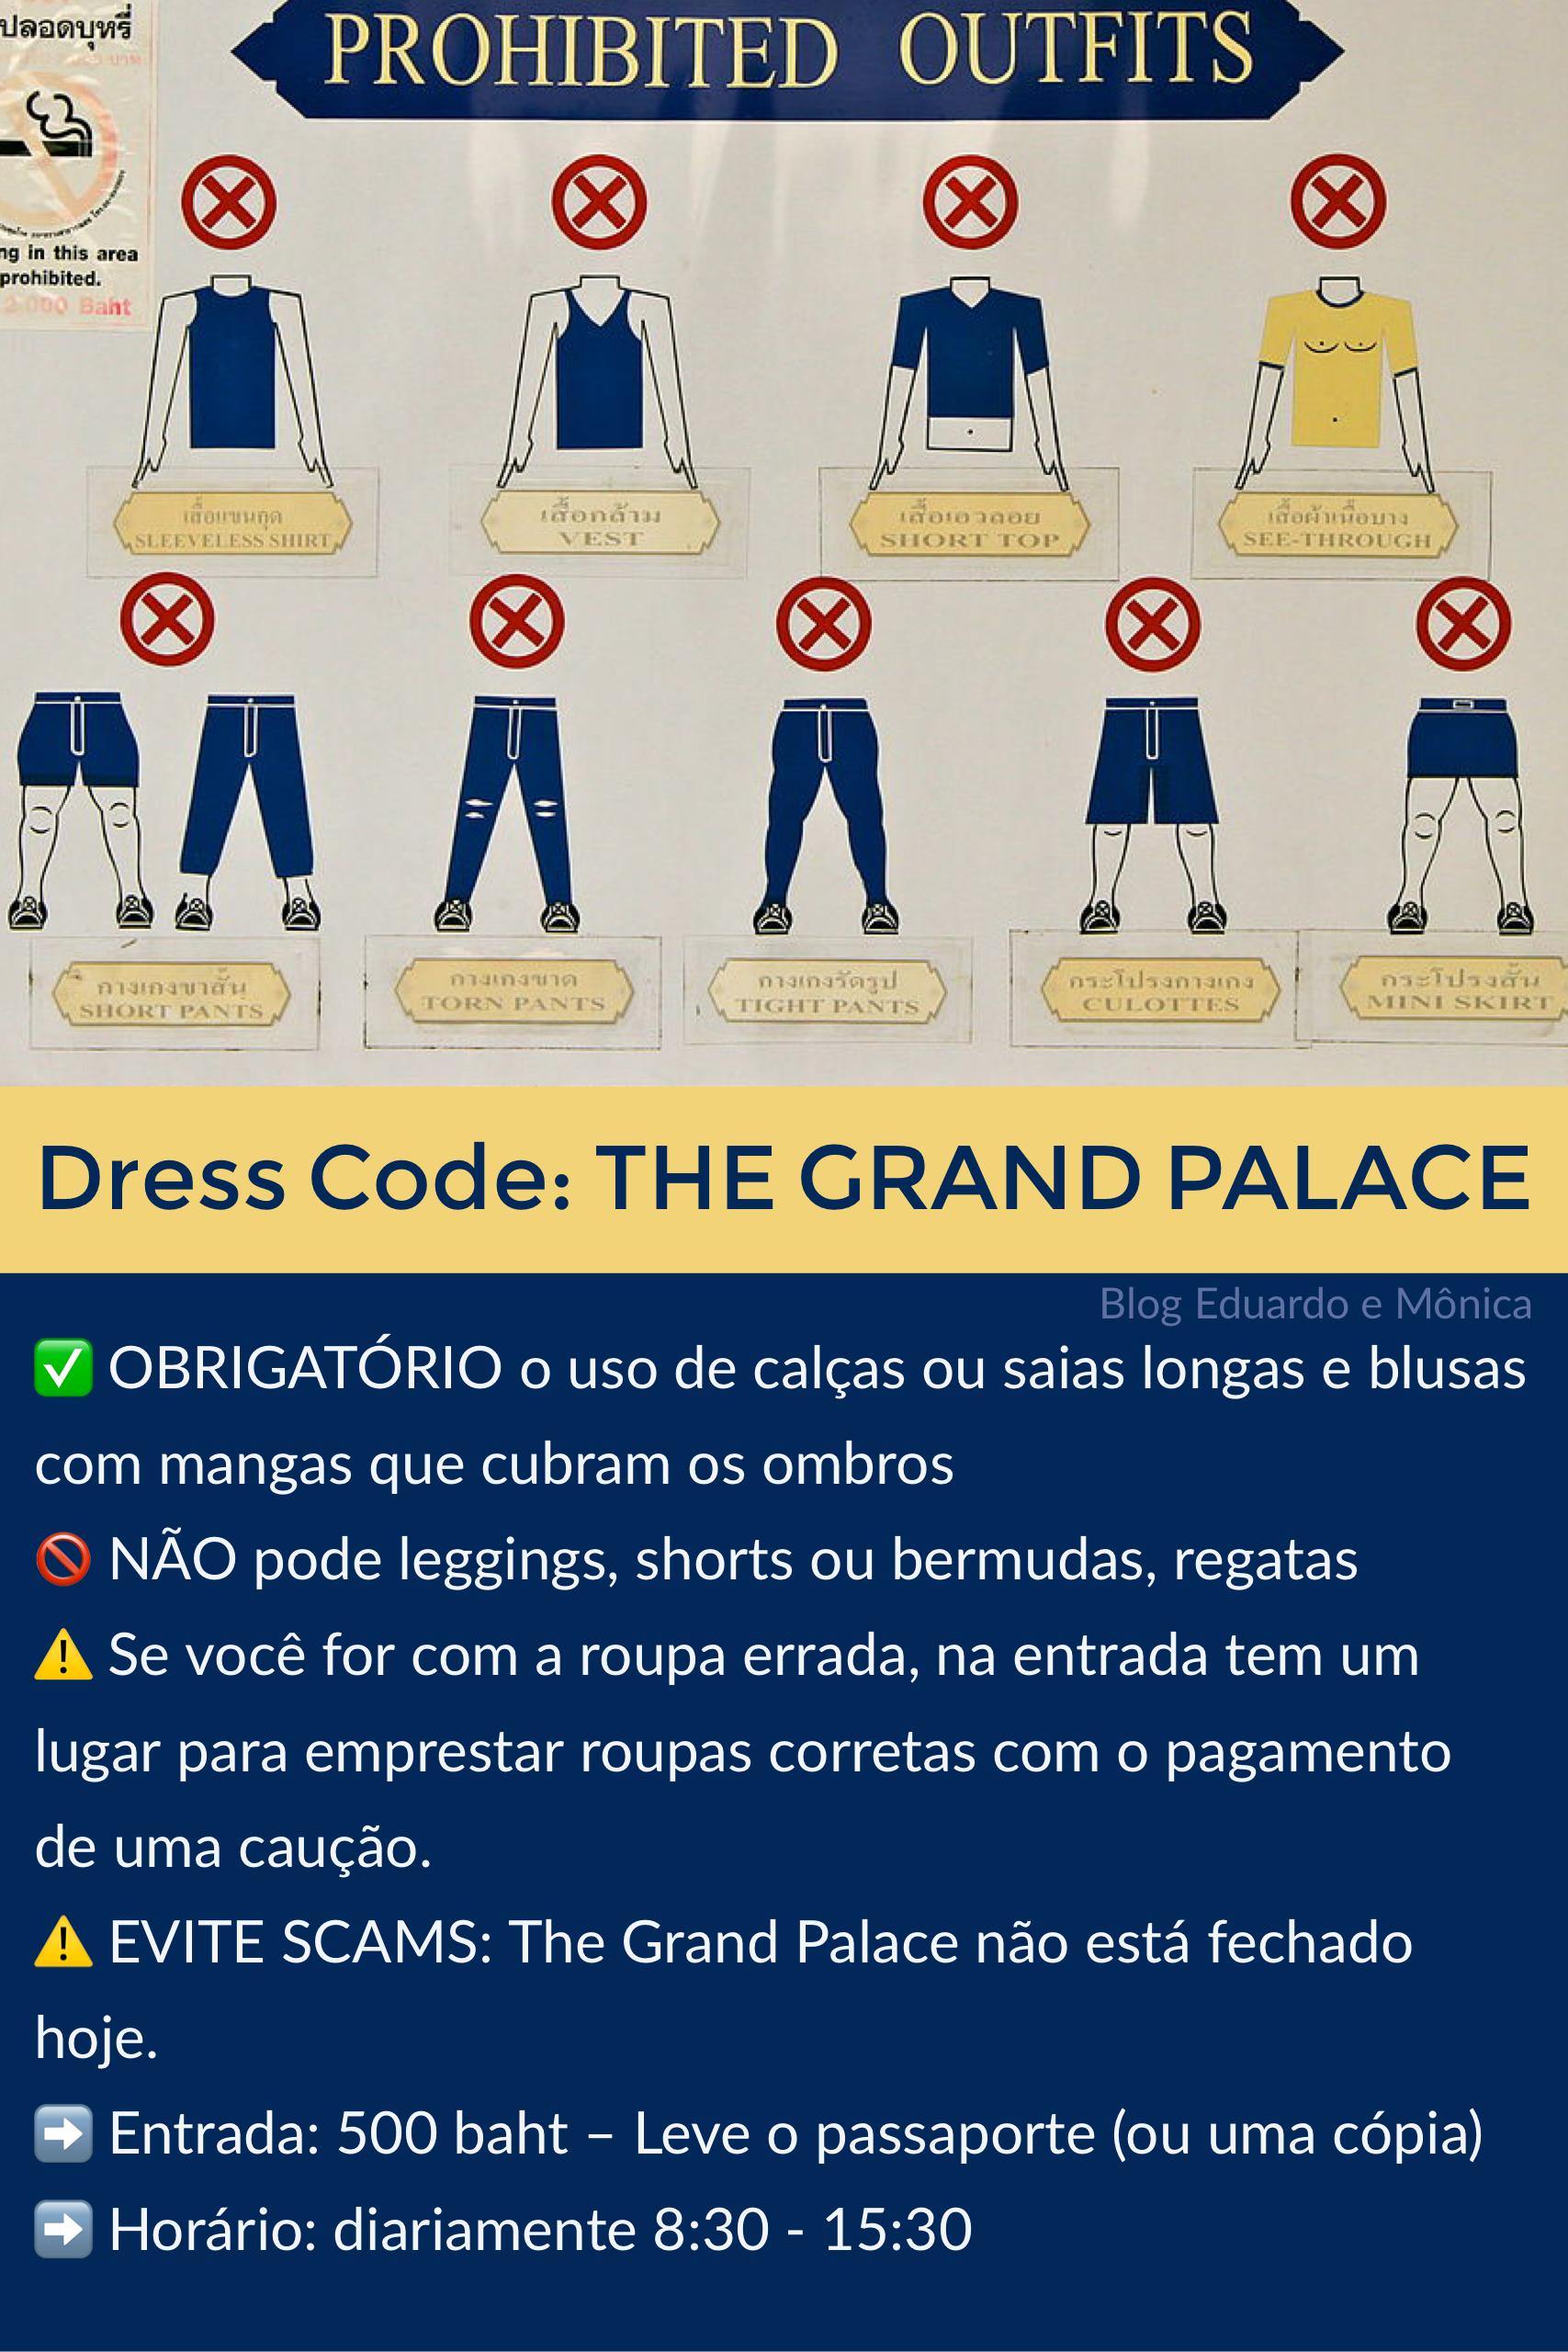 Dress Code para o Grand Palace